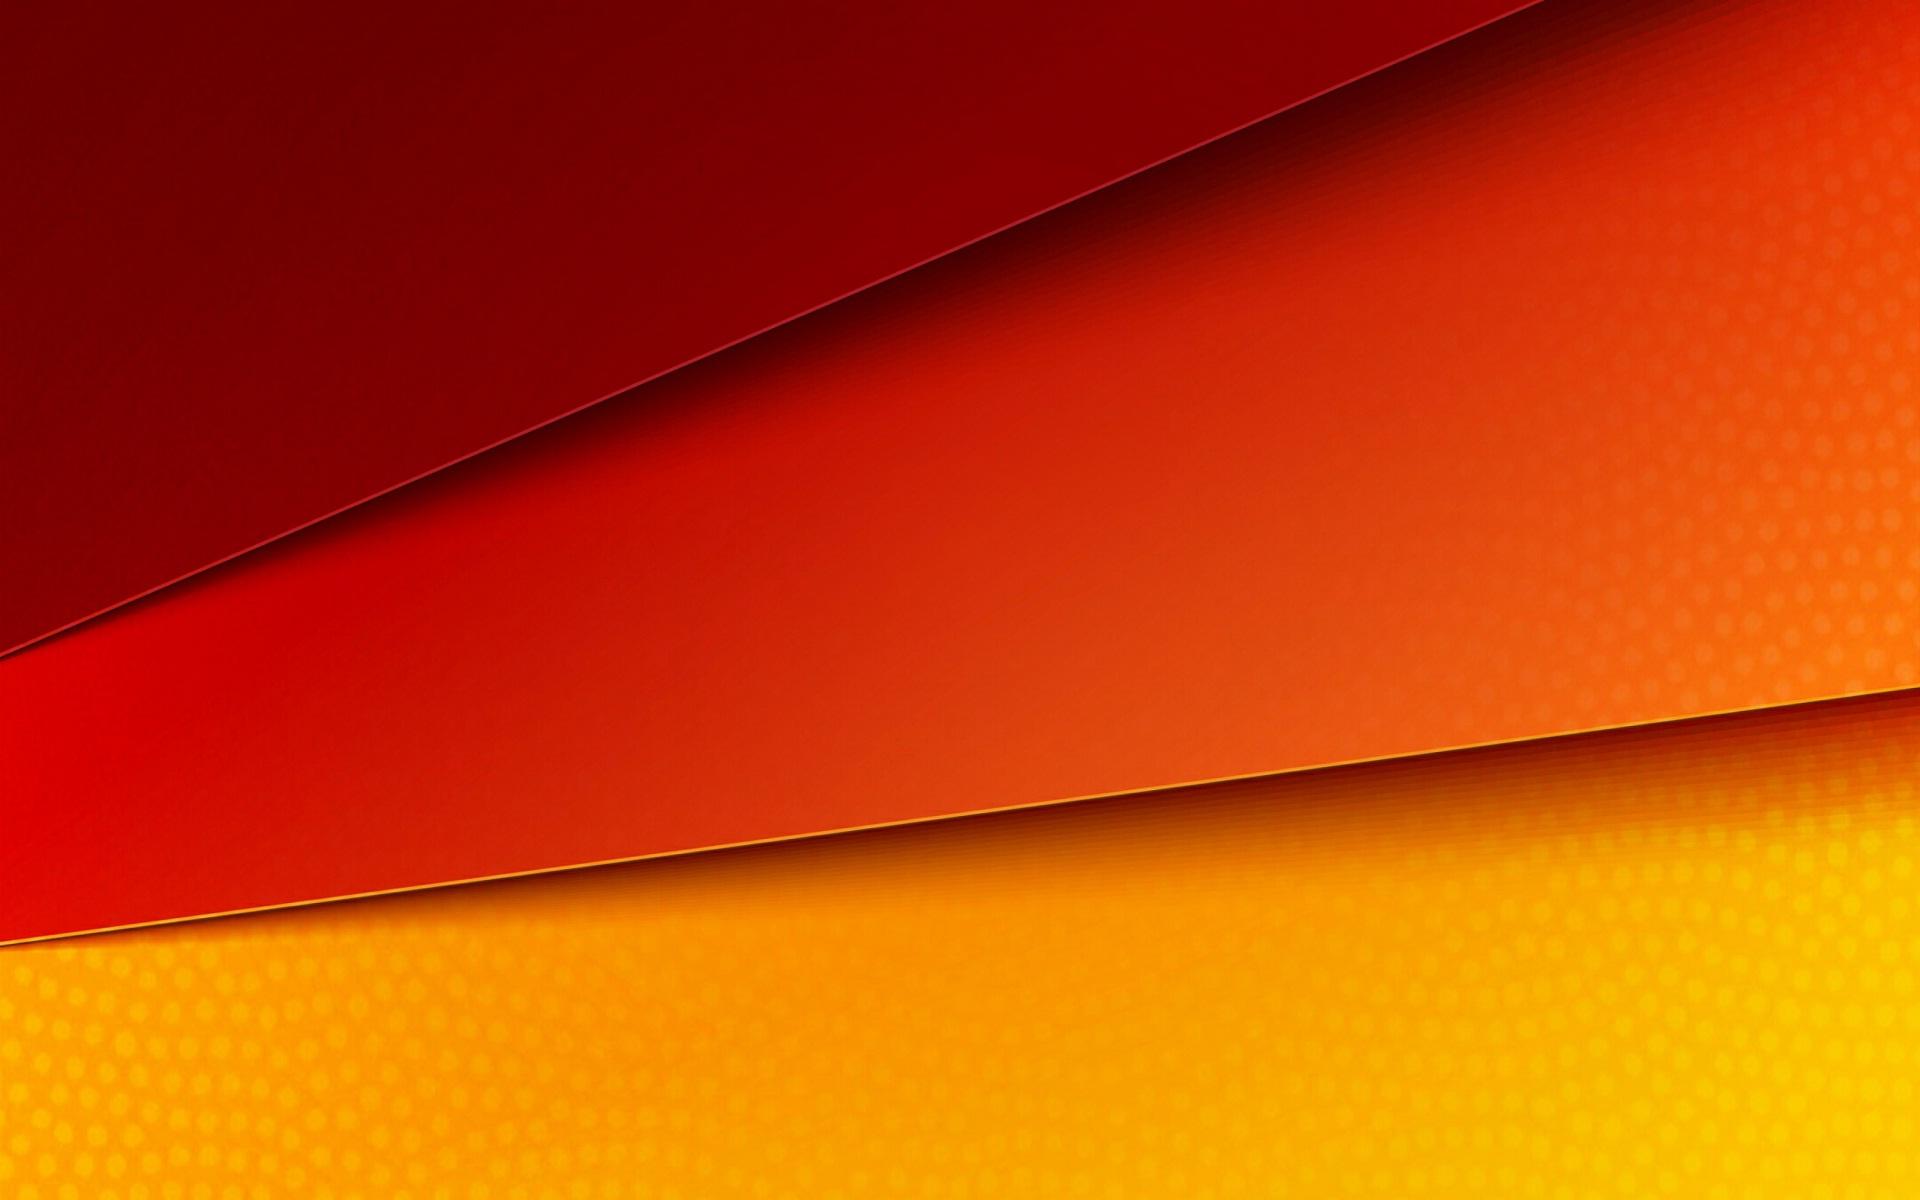 Plain Orange Wallpapers (28 Wallpapers) – Adorable Wallpapers